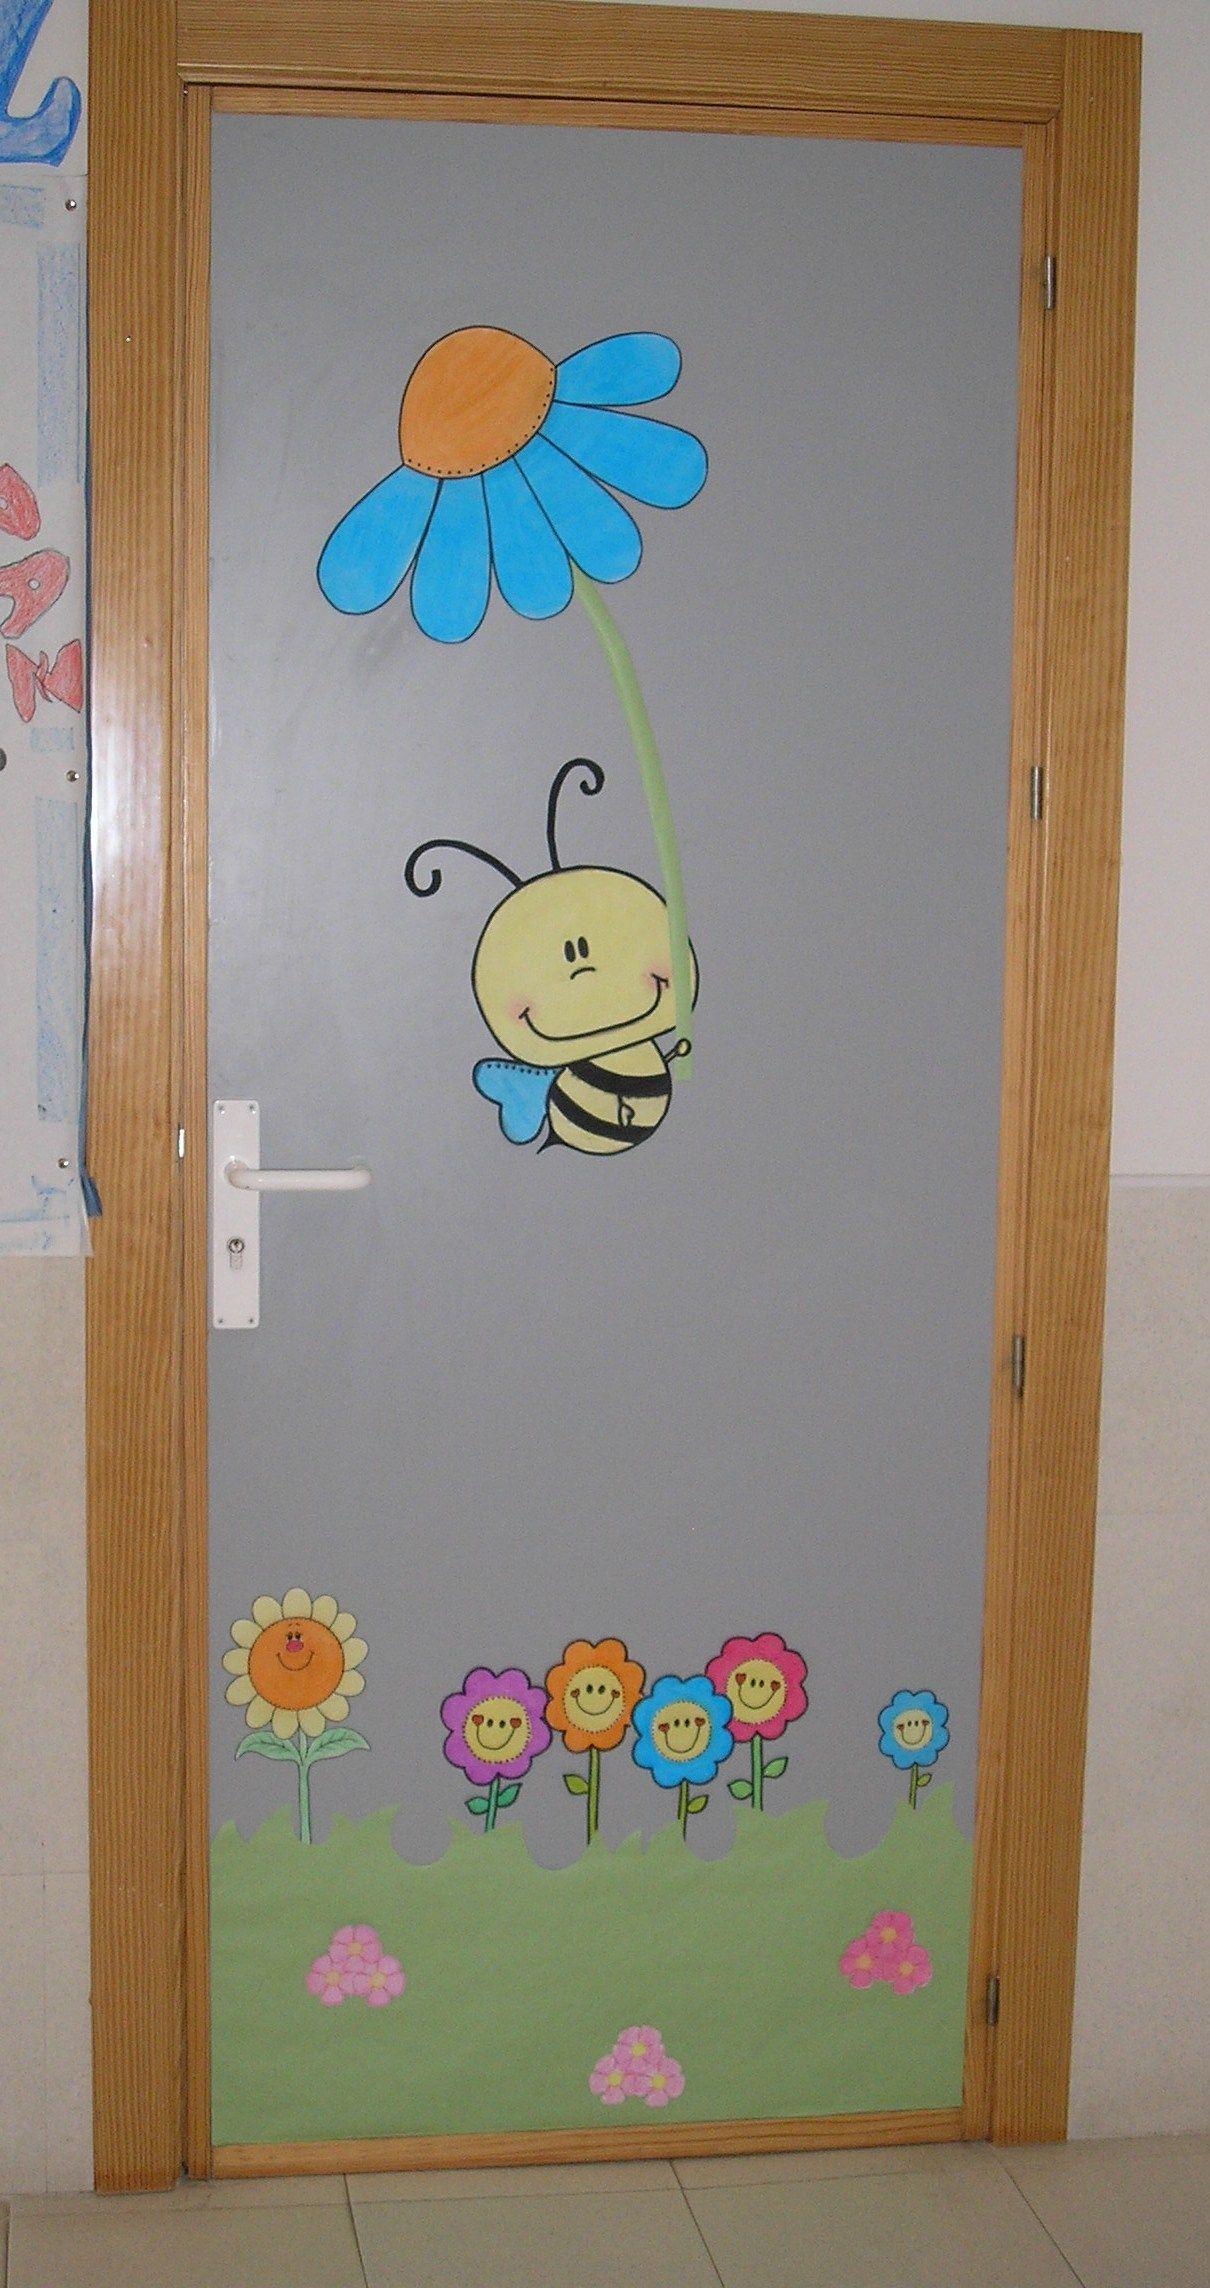 Mi puerta de infantil vestida de primavera cole de for Decoracion puerta aula infantil